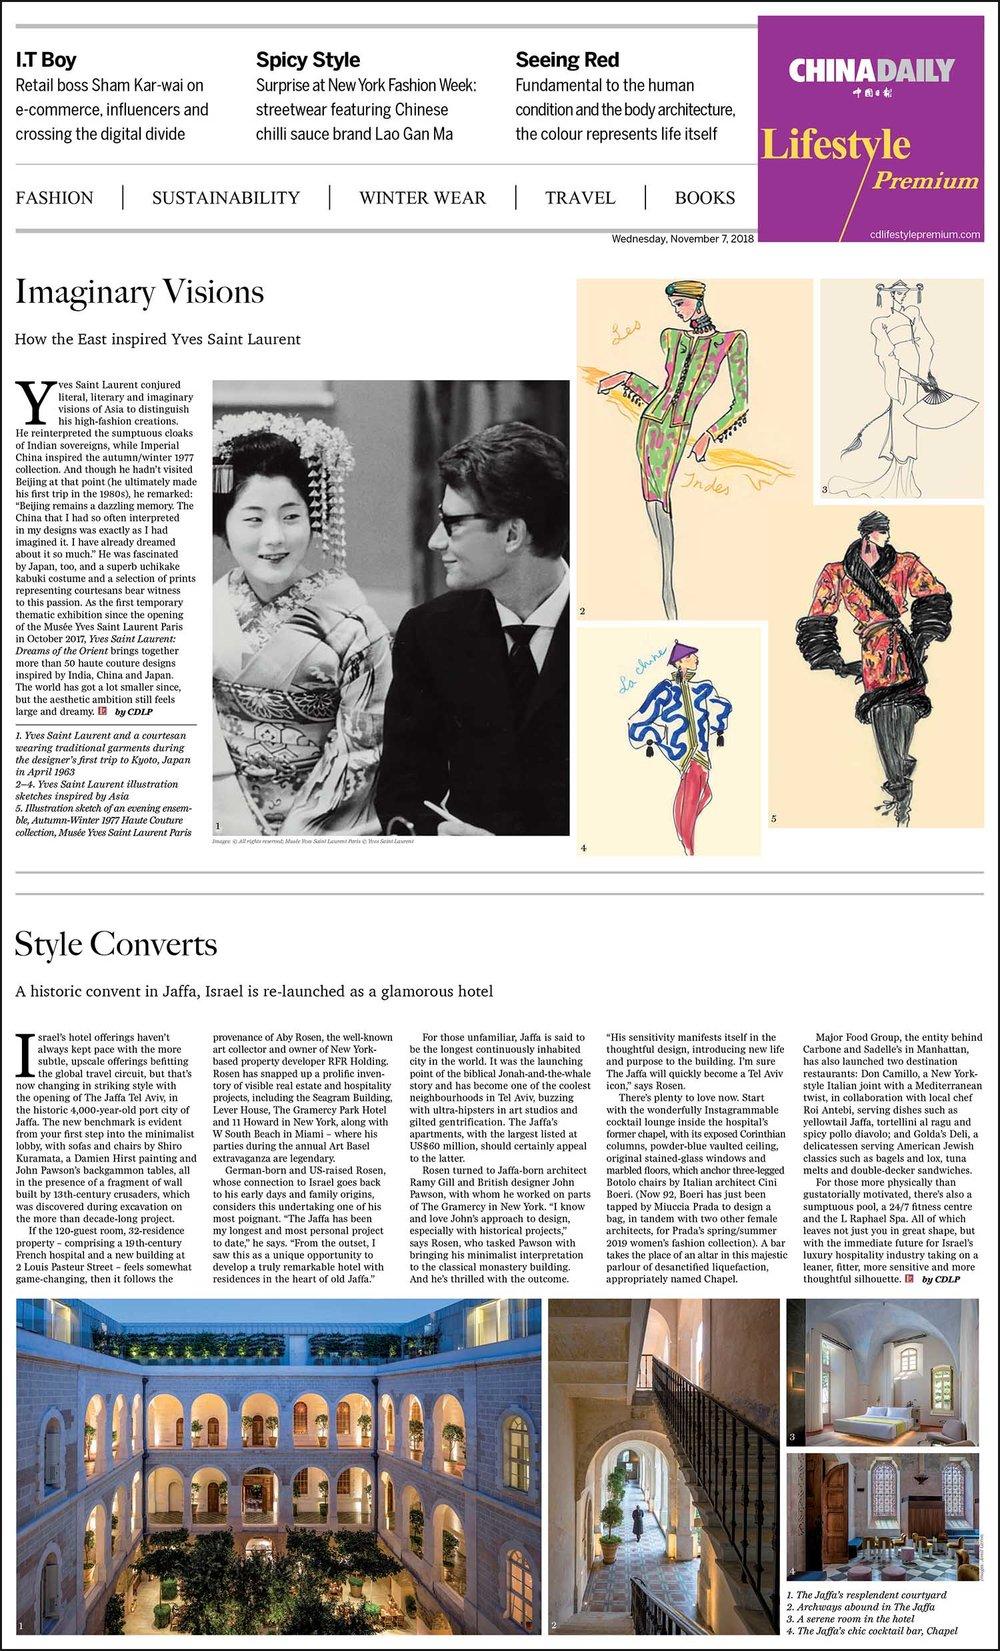 November 7 Issue